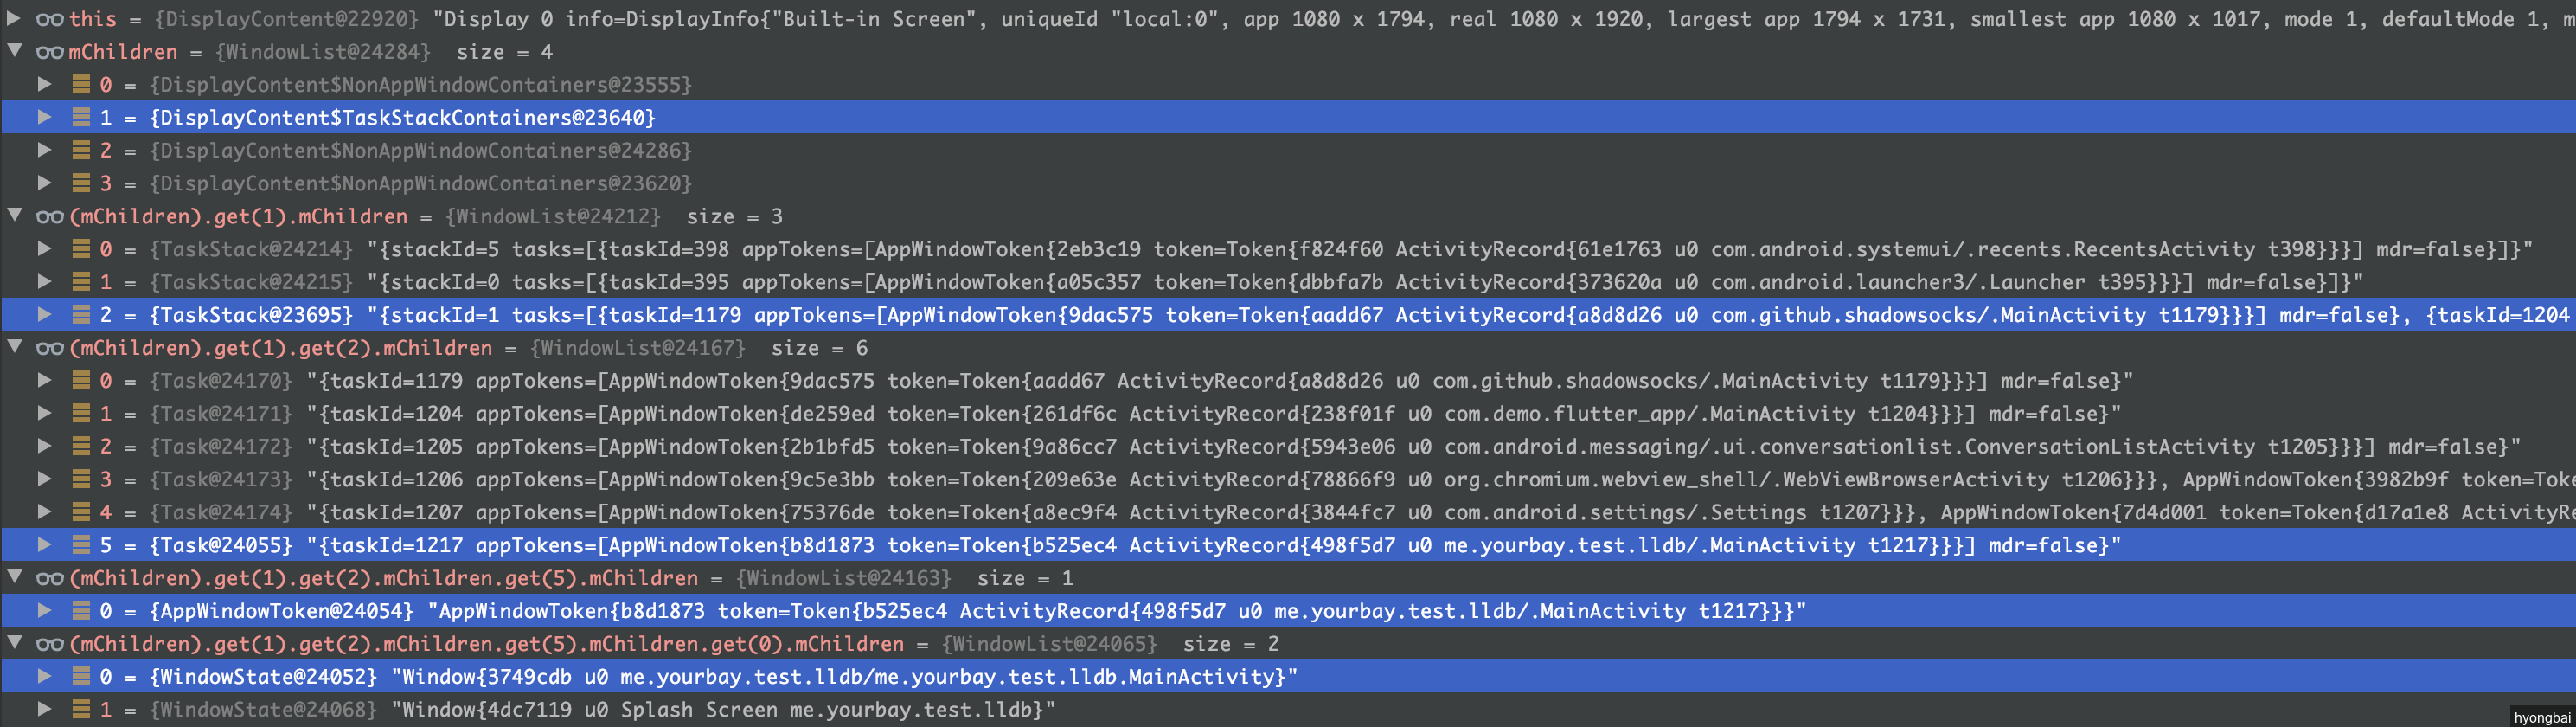 aosp-DisplayContent-forAllWindows-mChildren-till-demo-lldb.png